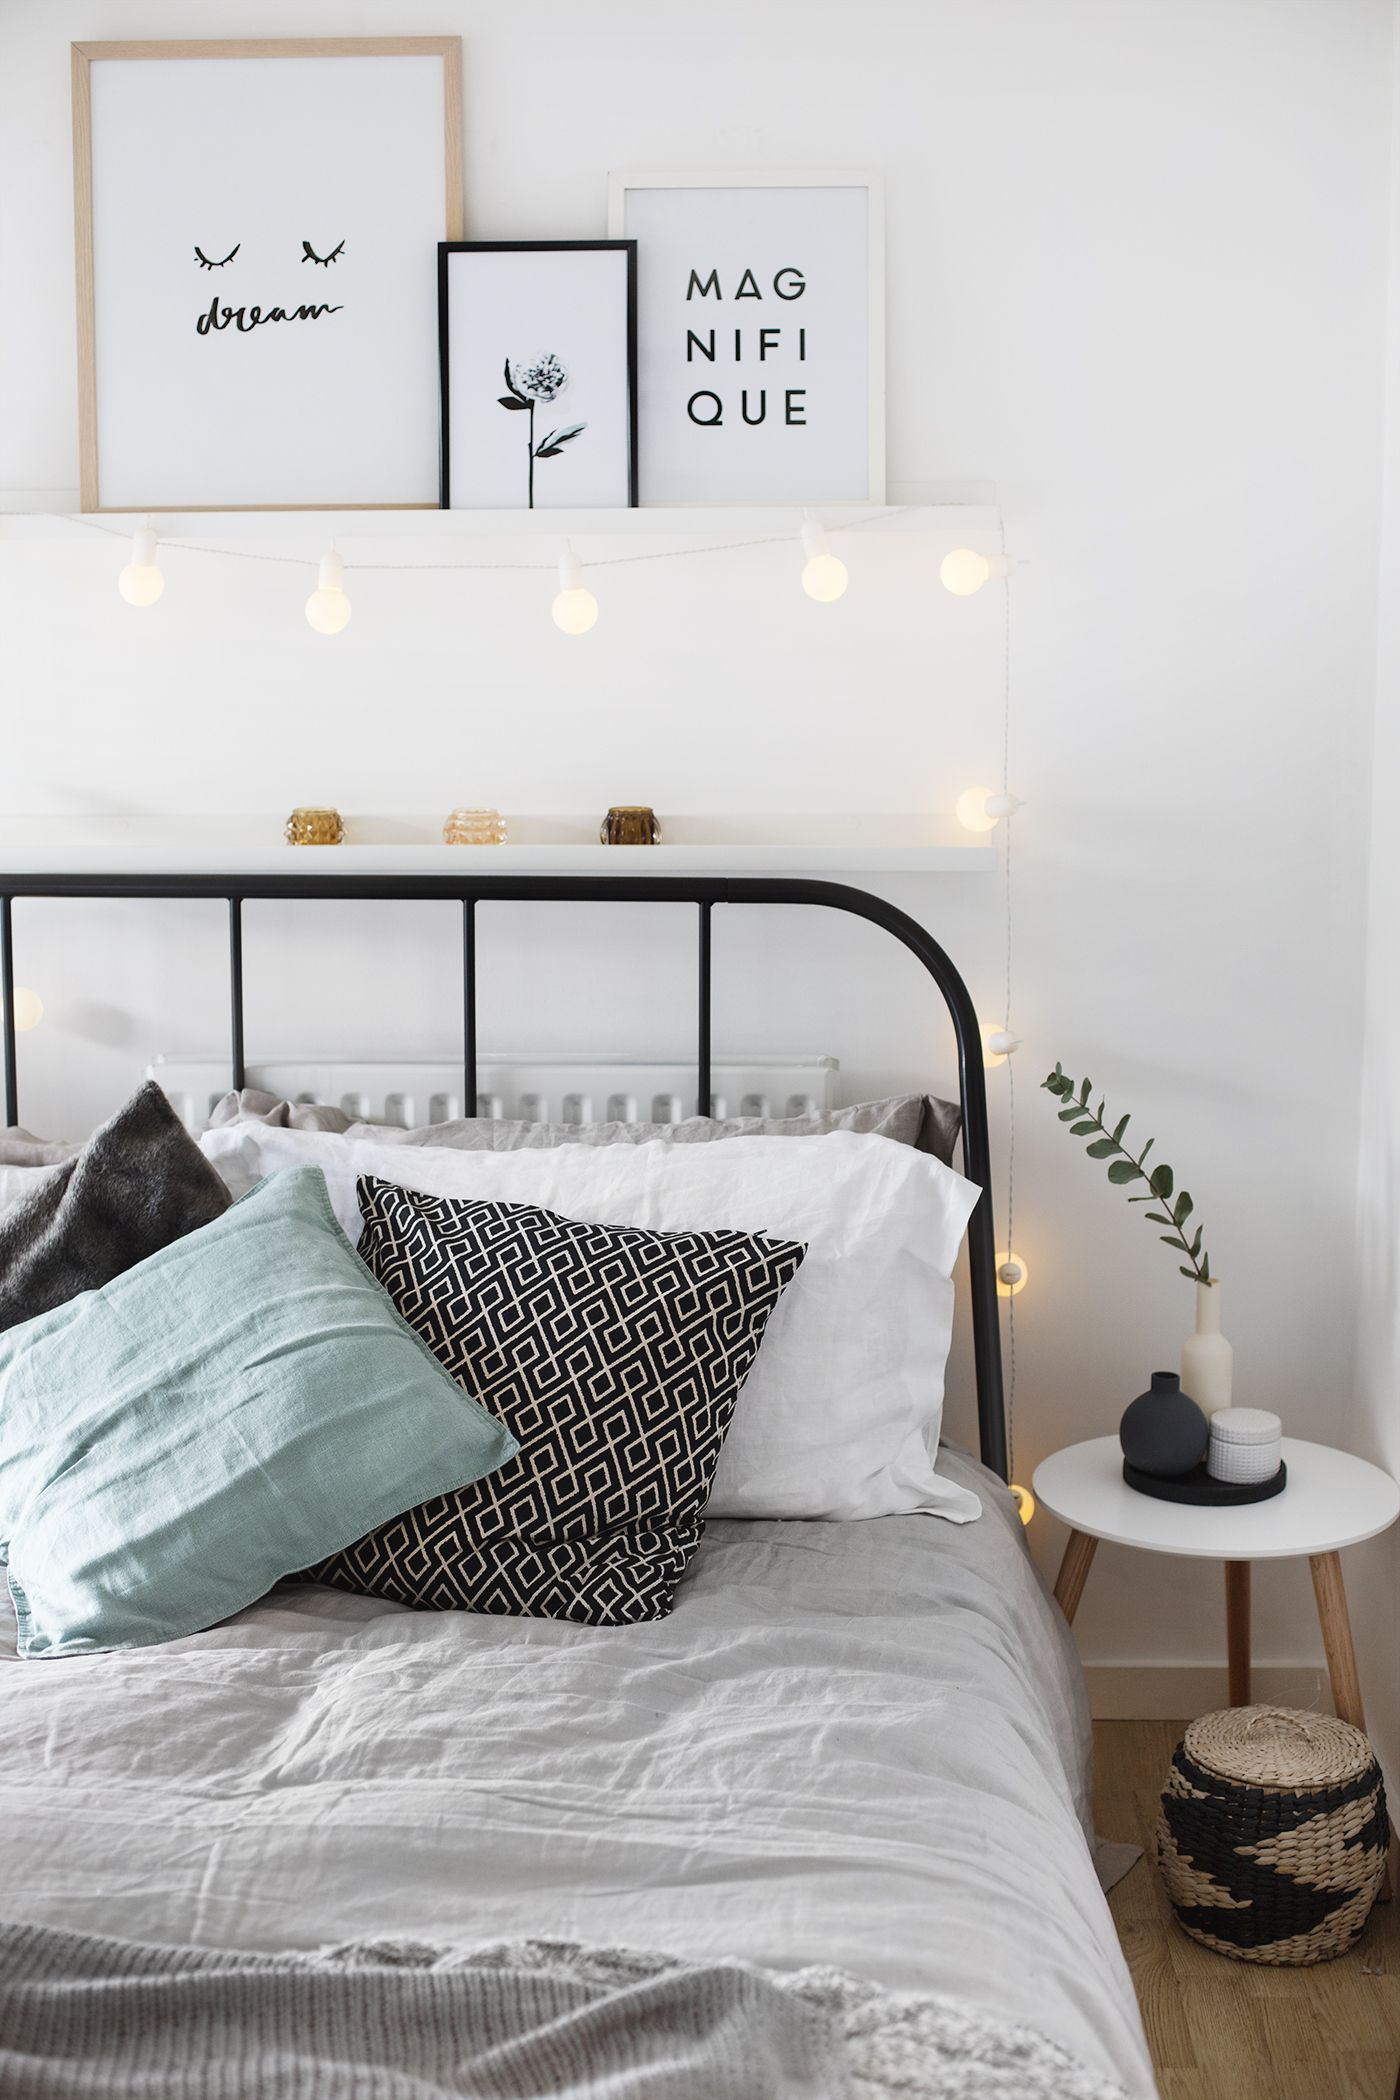 Small bedroom ideas Small bedroom ideas